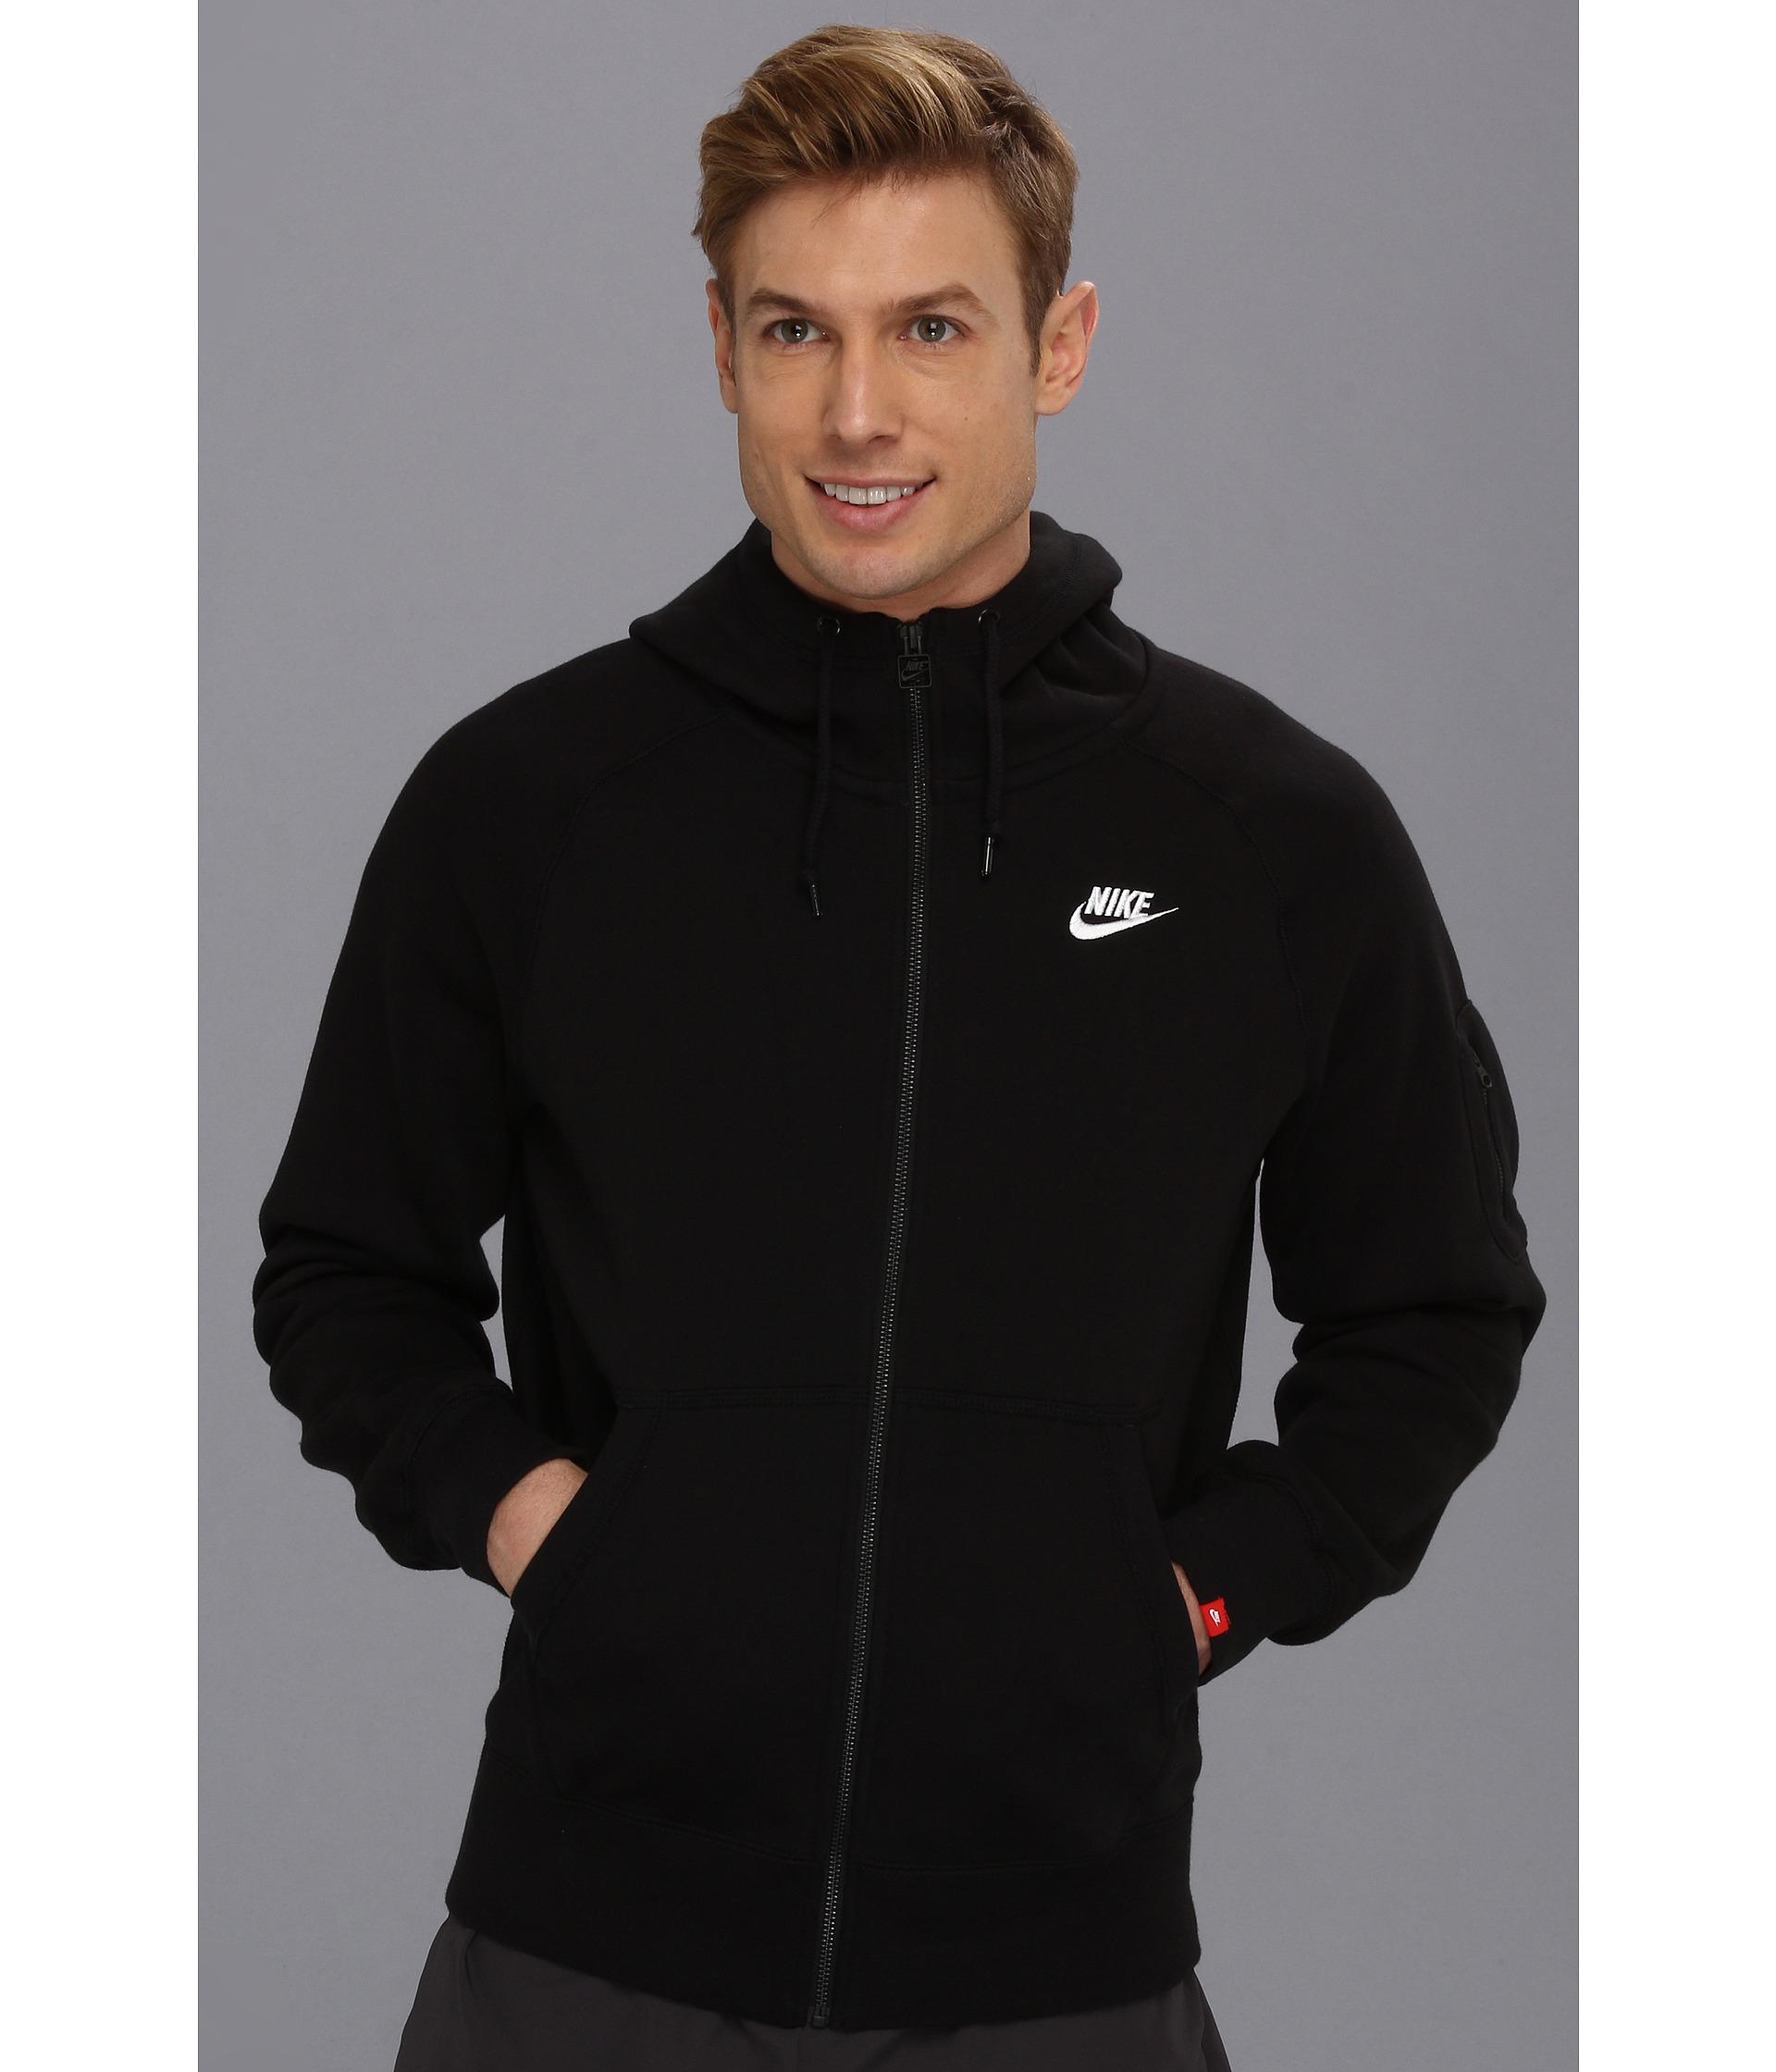 fcae3e7204 Nike Aw77 Fleece Crew Mens Sweatshirt